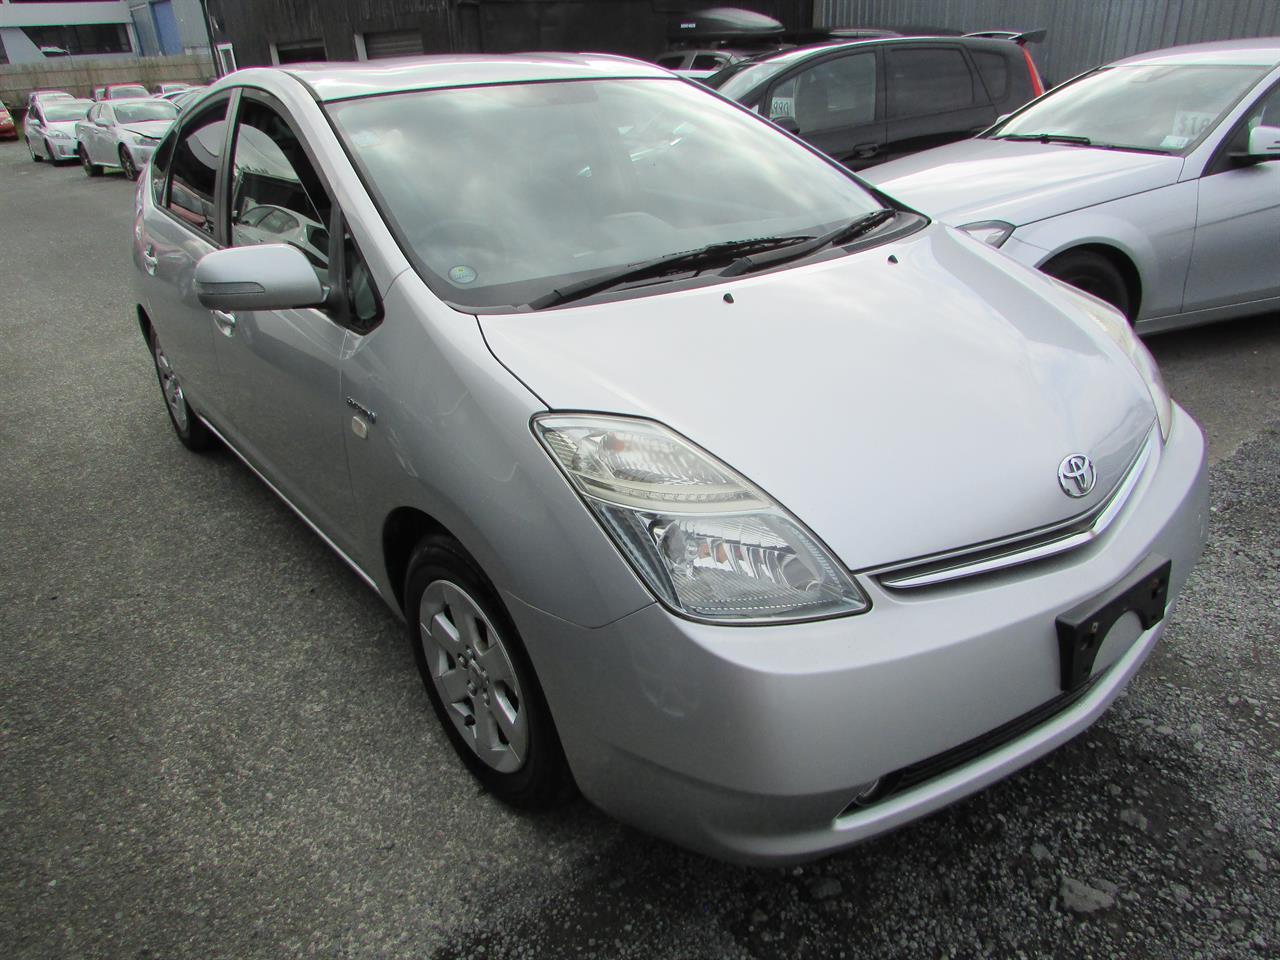 Motors Cars & parts Cars : 2008 Toyota Prius smart key reverse camera Cruise control alloywheels